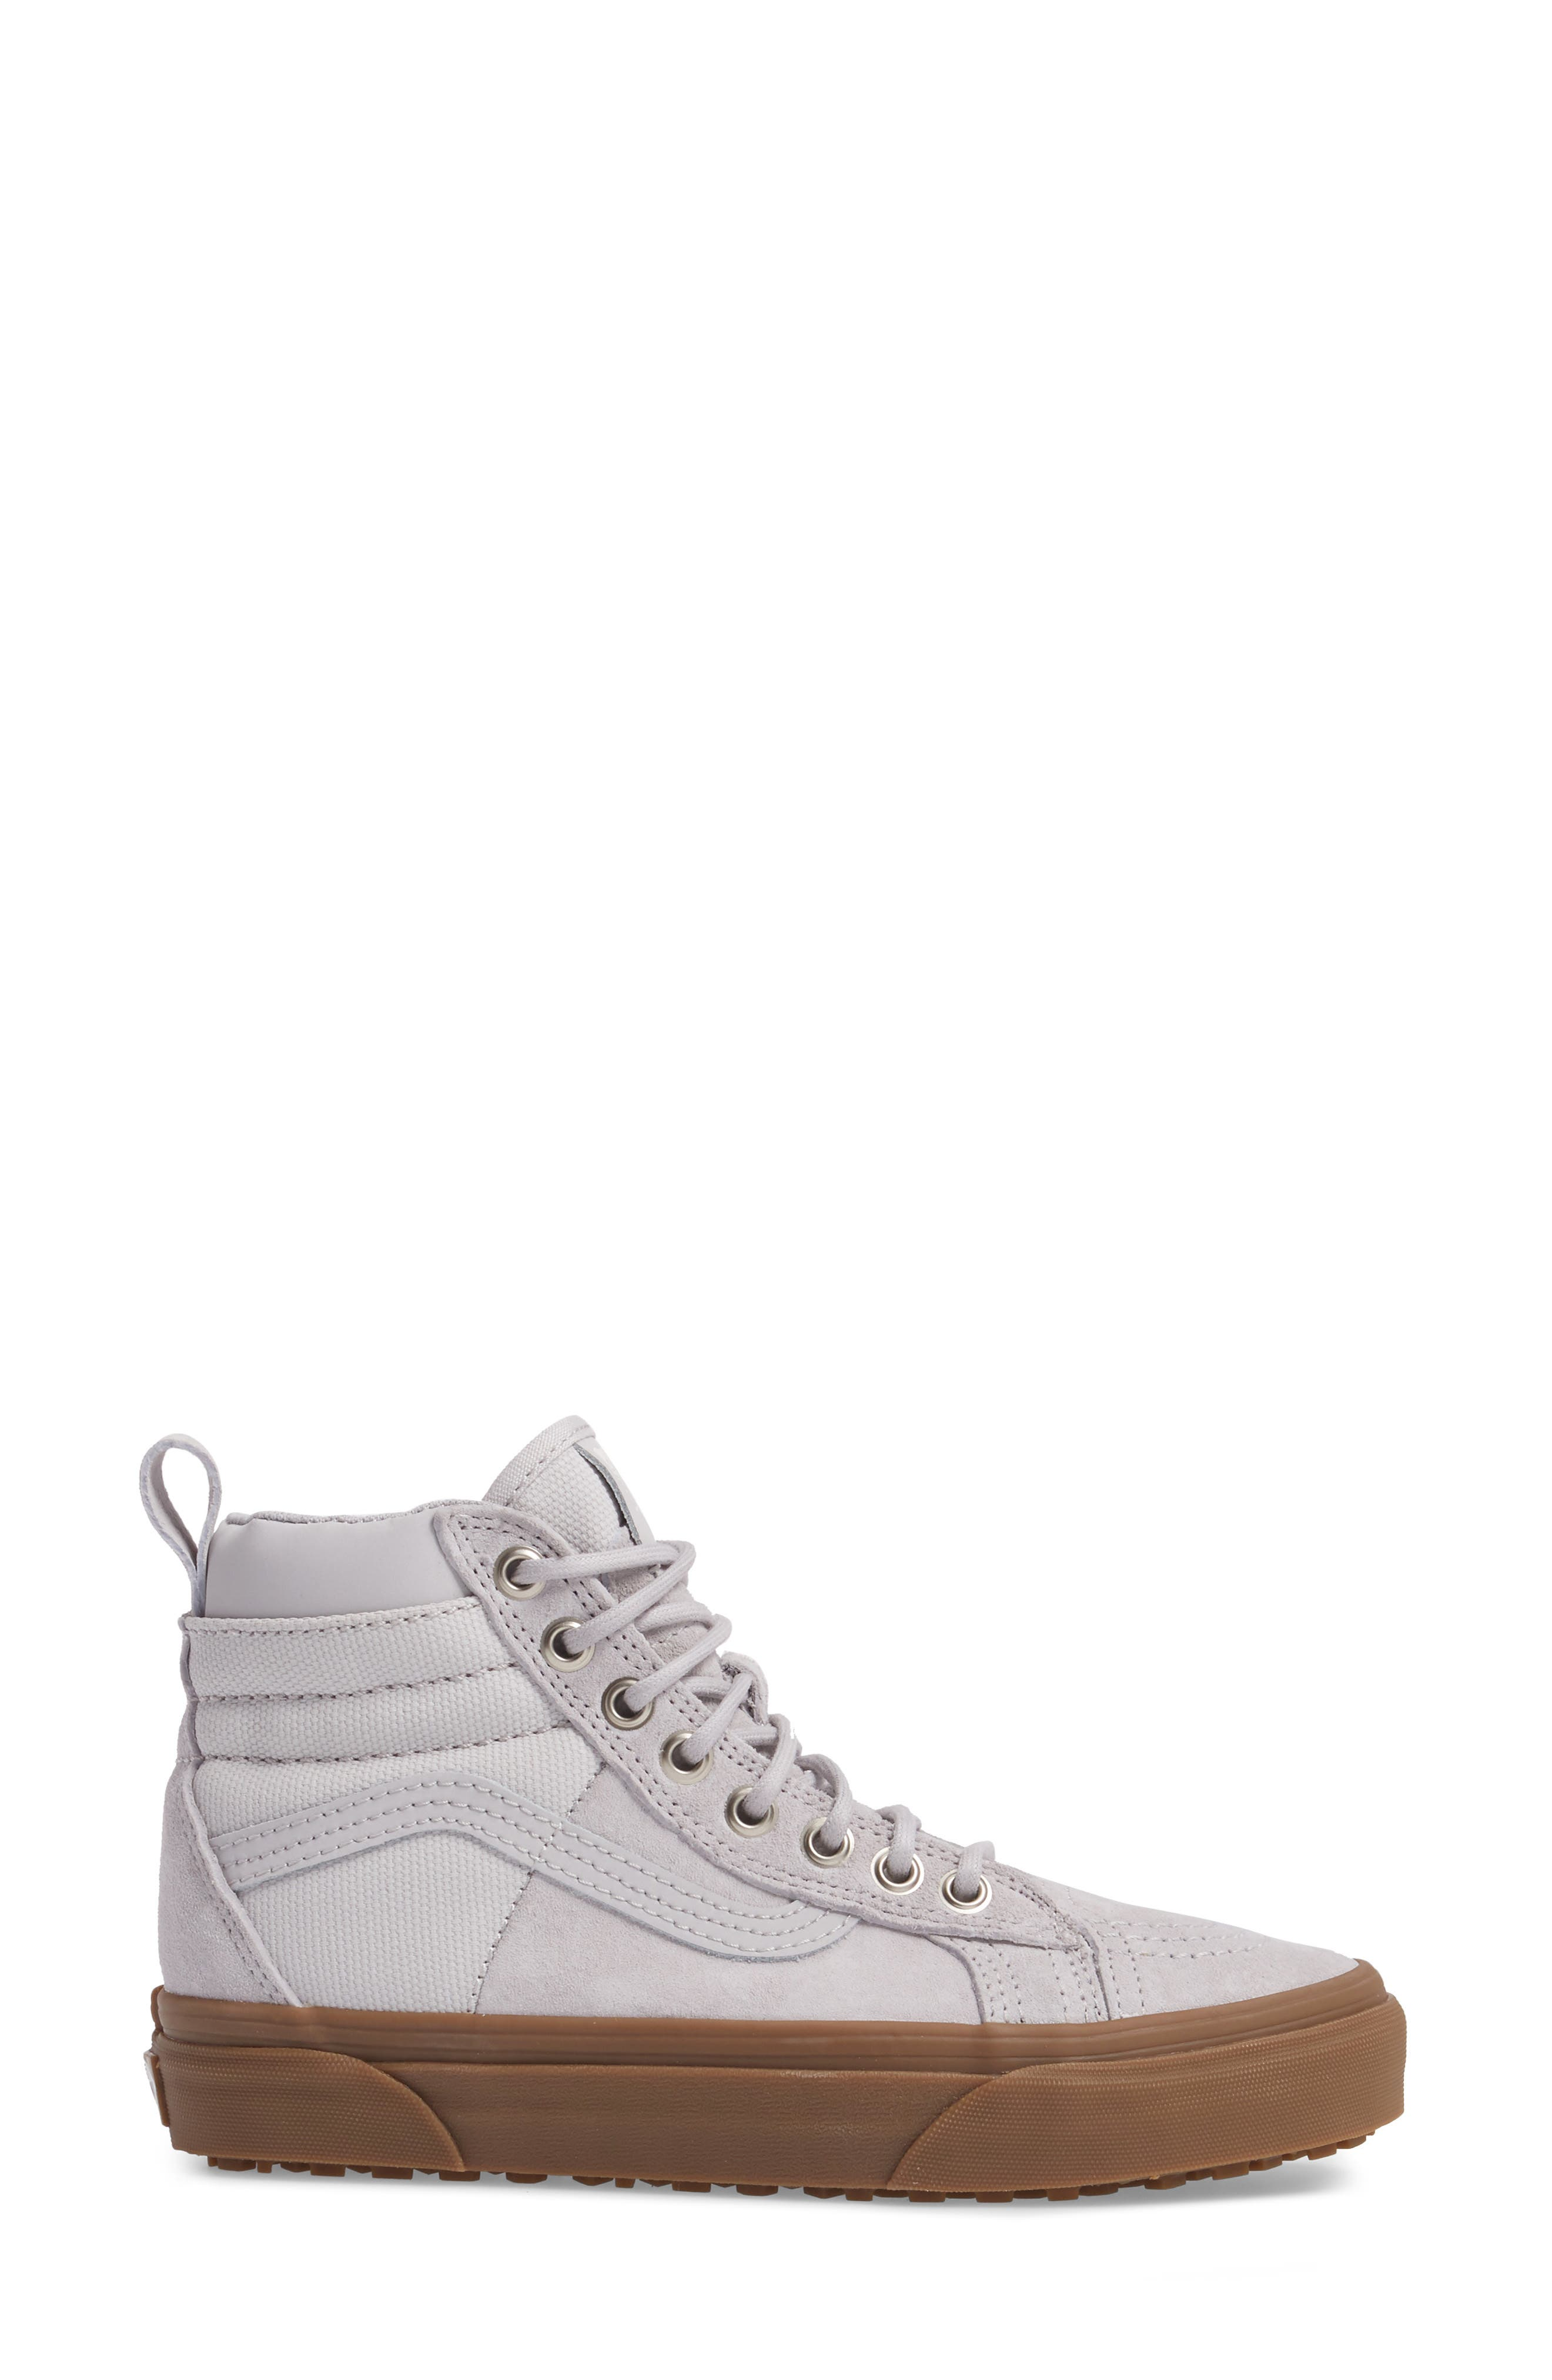 Sk8-Hi 46 MTE DX Sneaker,                             Alternate thumbnail 3, color,                             030